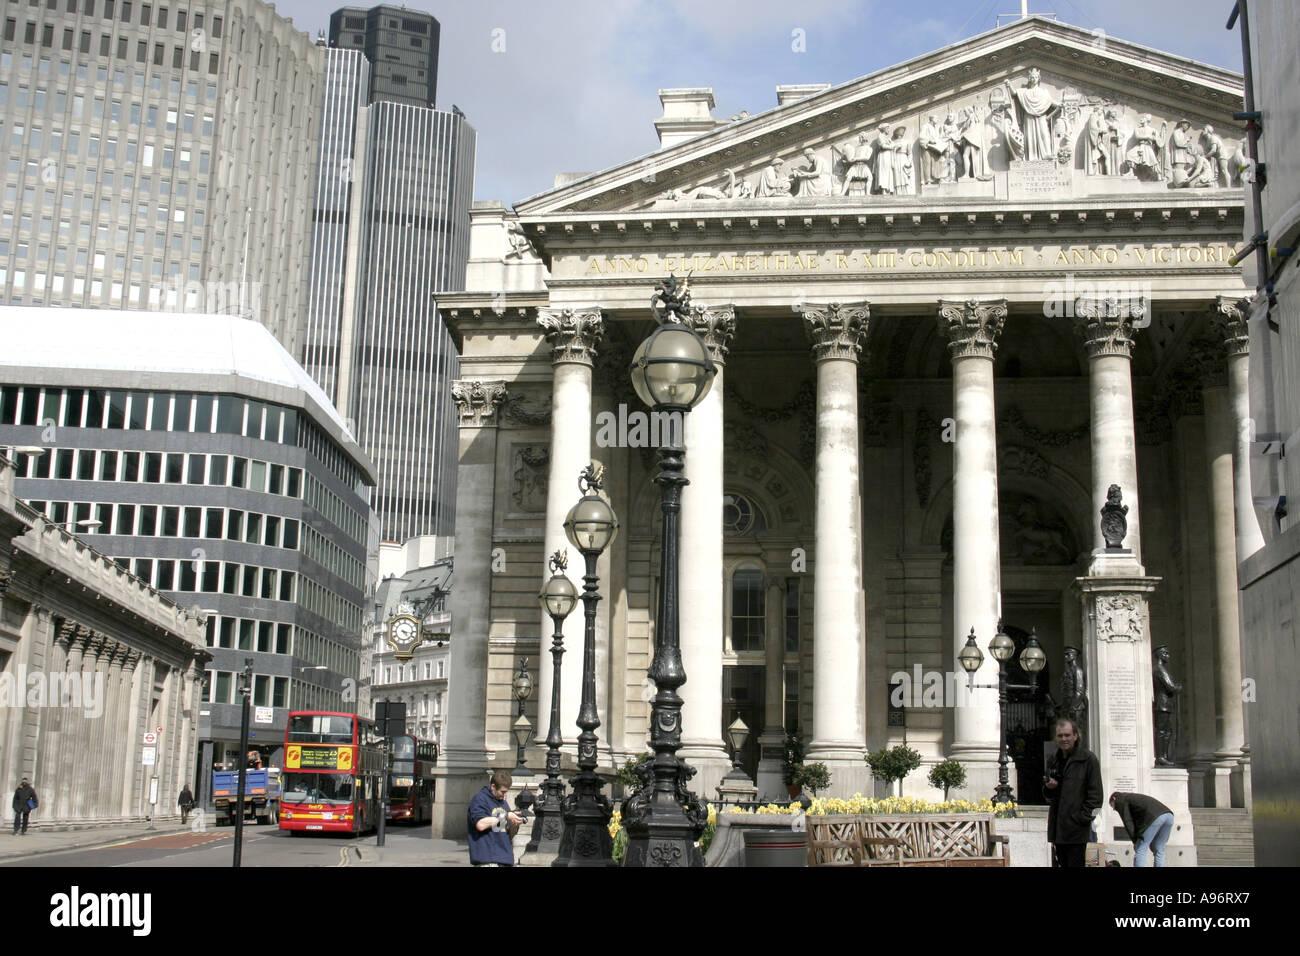 City of London.Royal Exchange Building.2006 Stock Photo